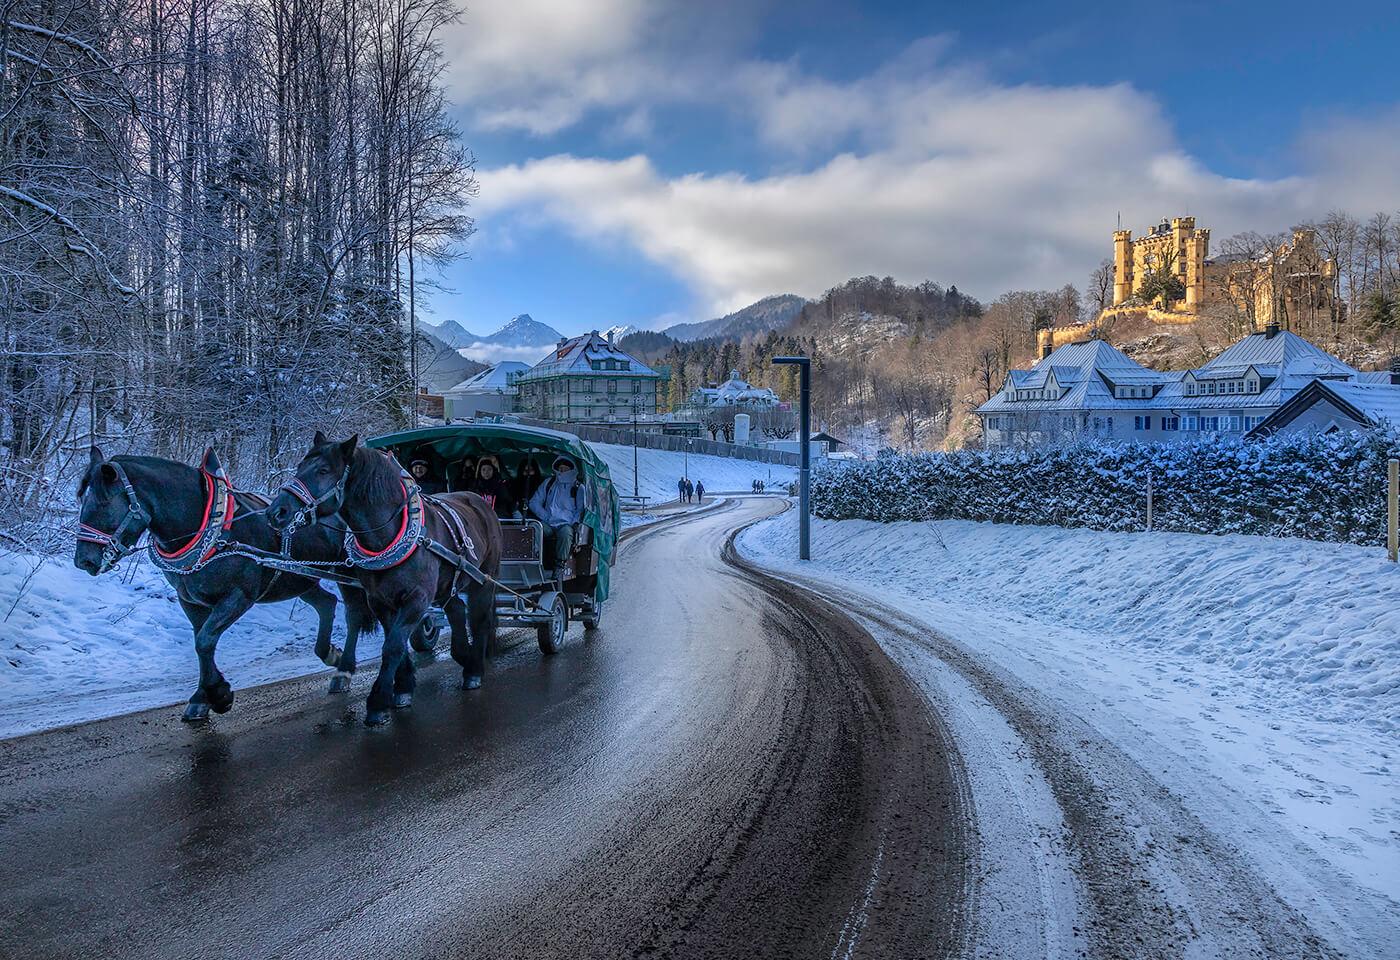 Snowy street by Greg Sullavan